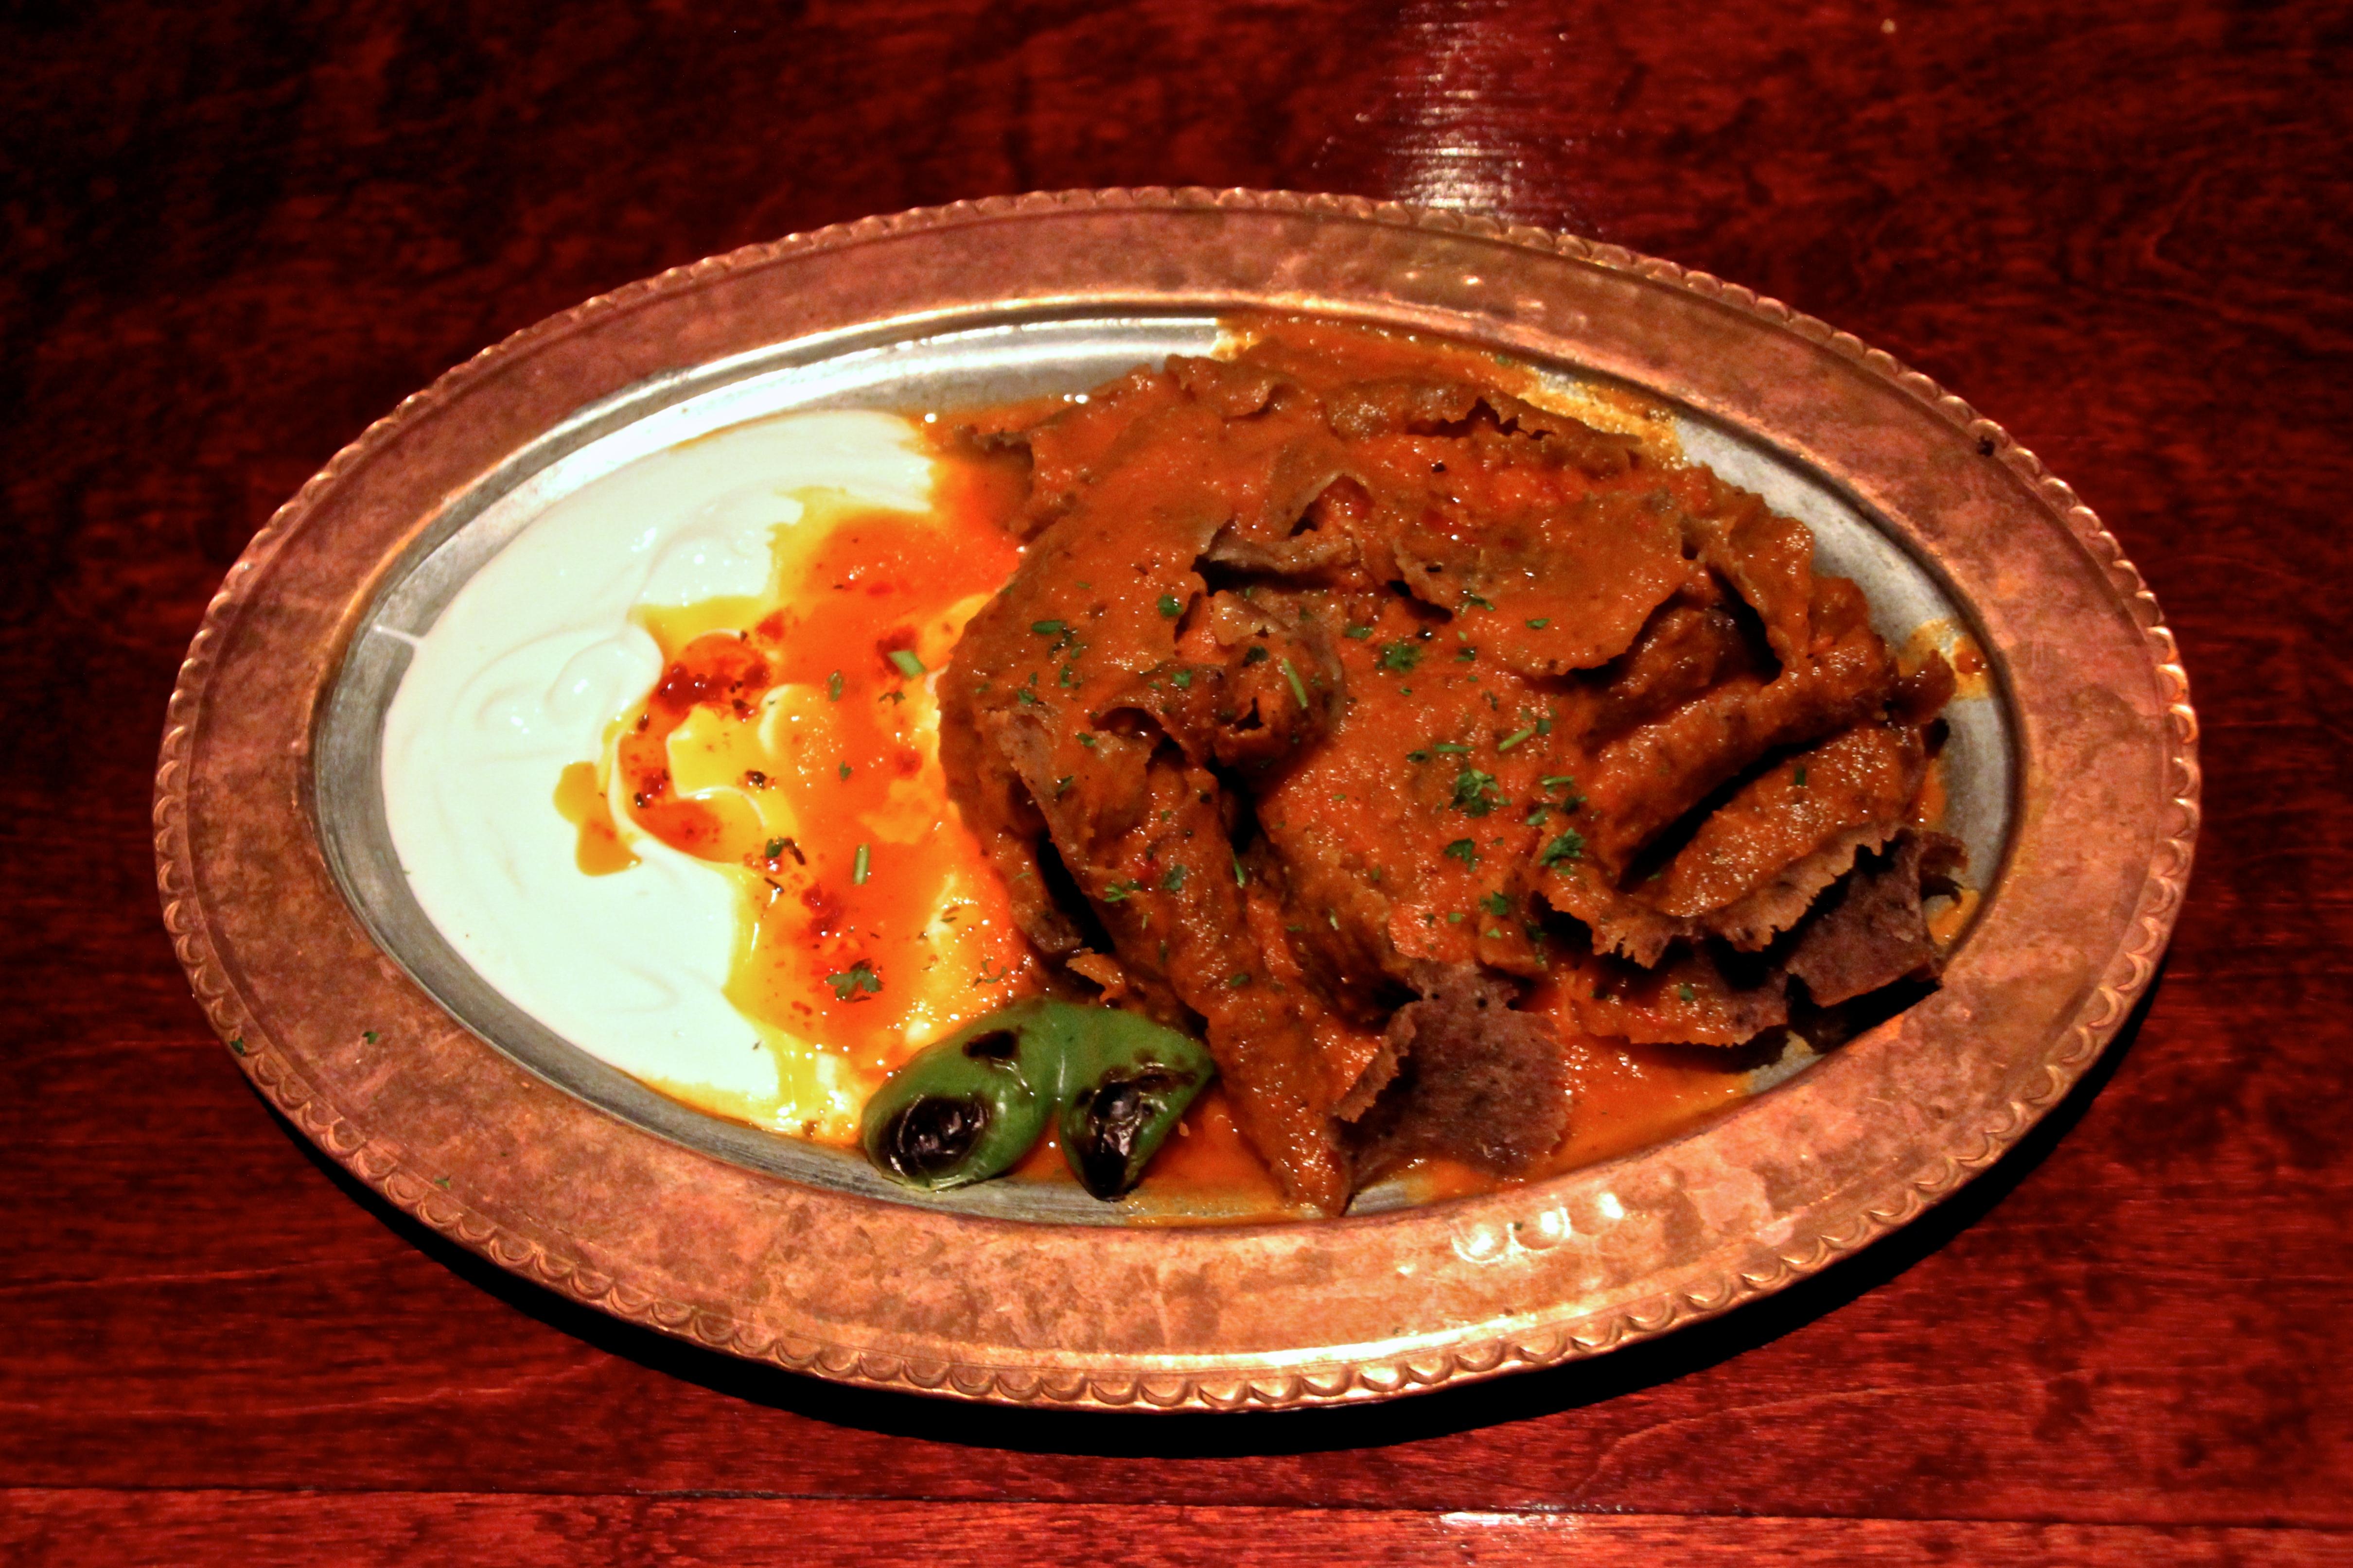 Minor Asia at Anatolian Kitchen – The Unvegan